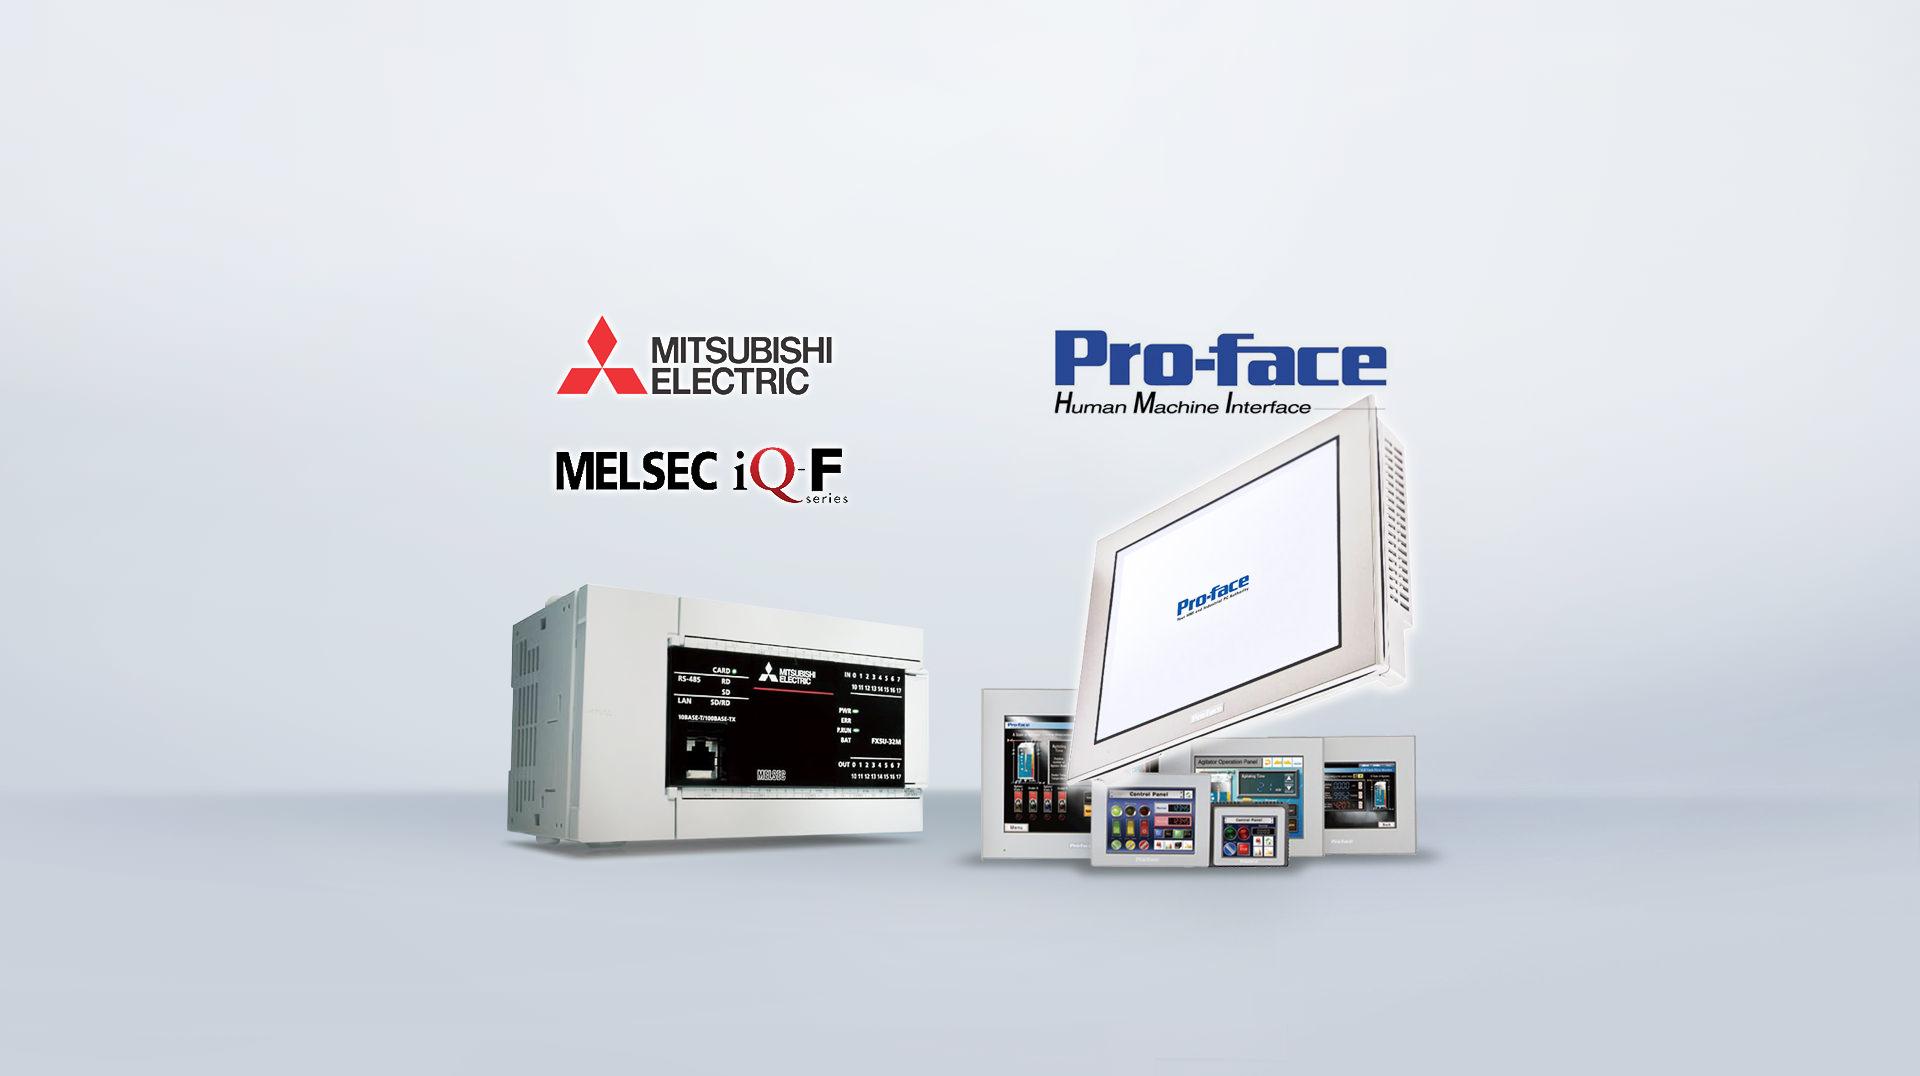 Pro-face 普羅菲司+三菱電機 Mitsubishi Electric